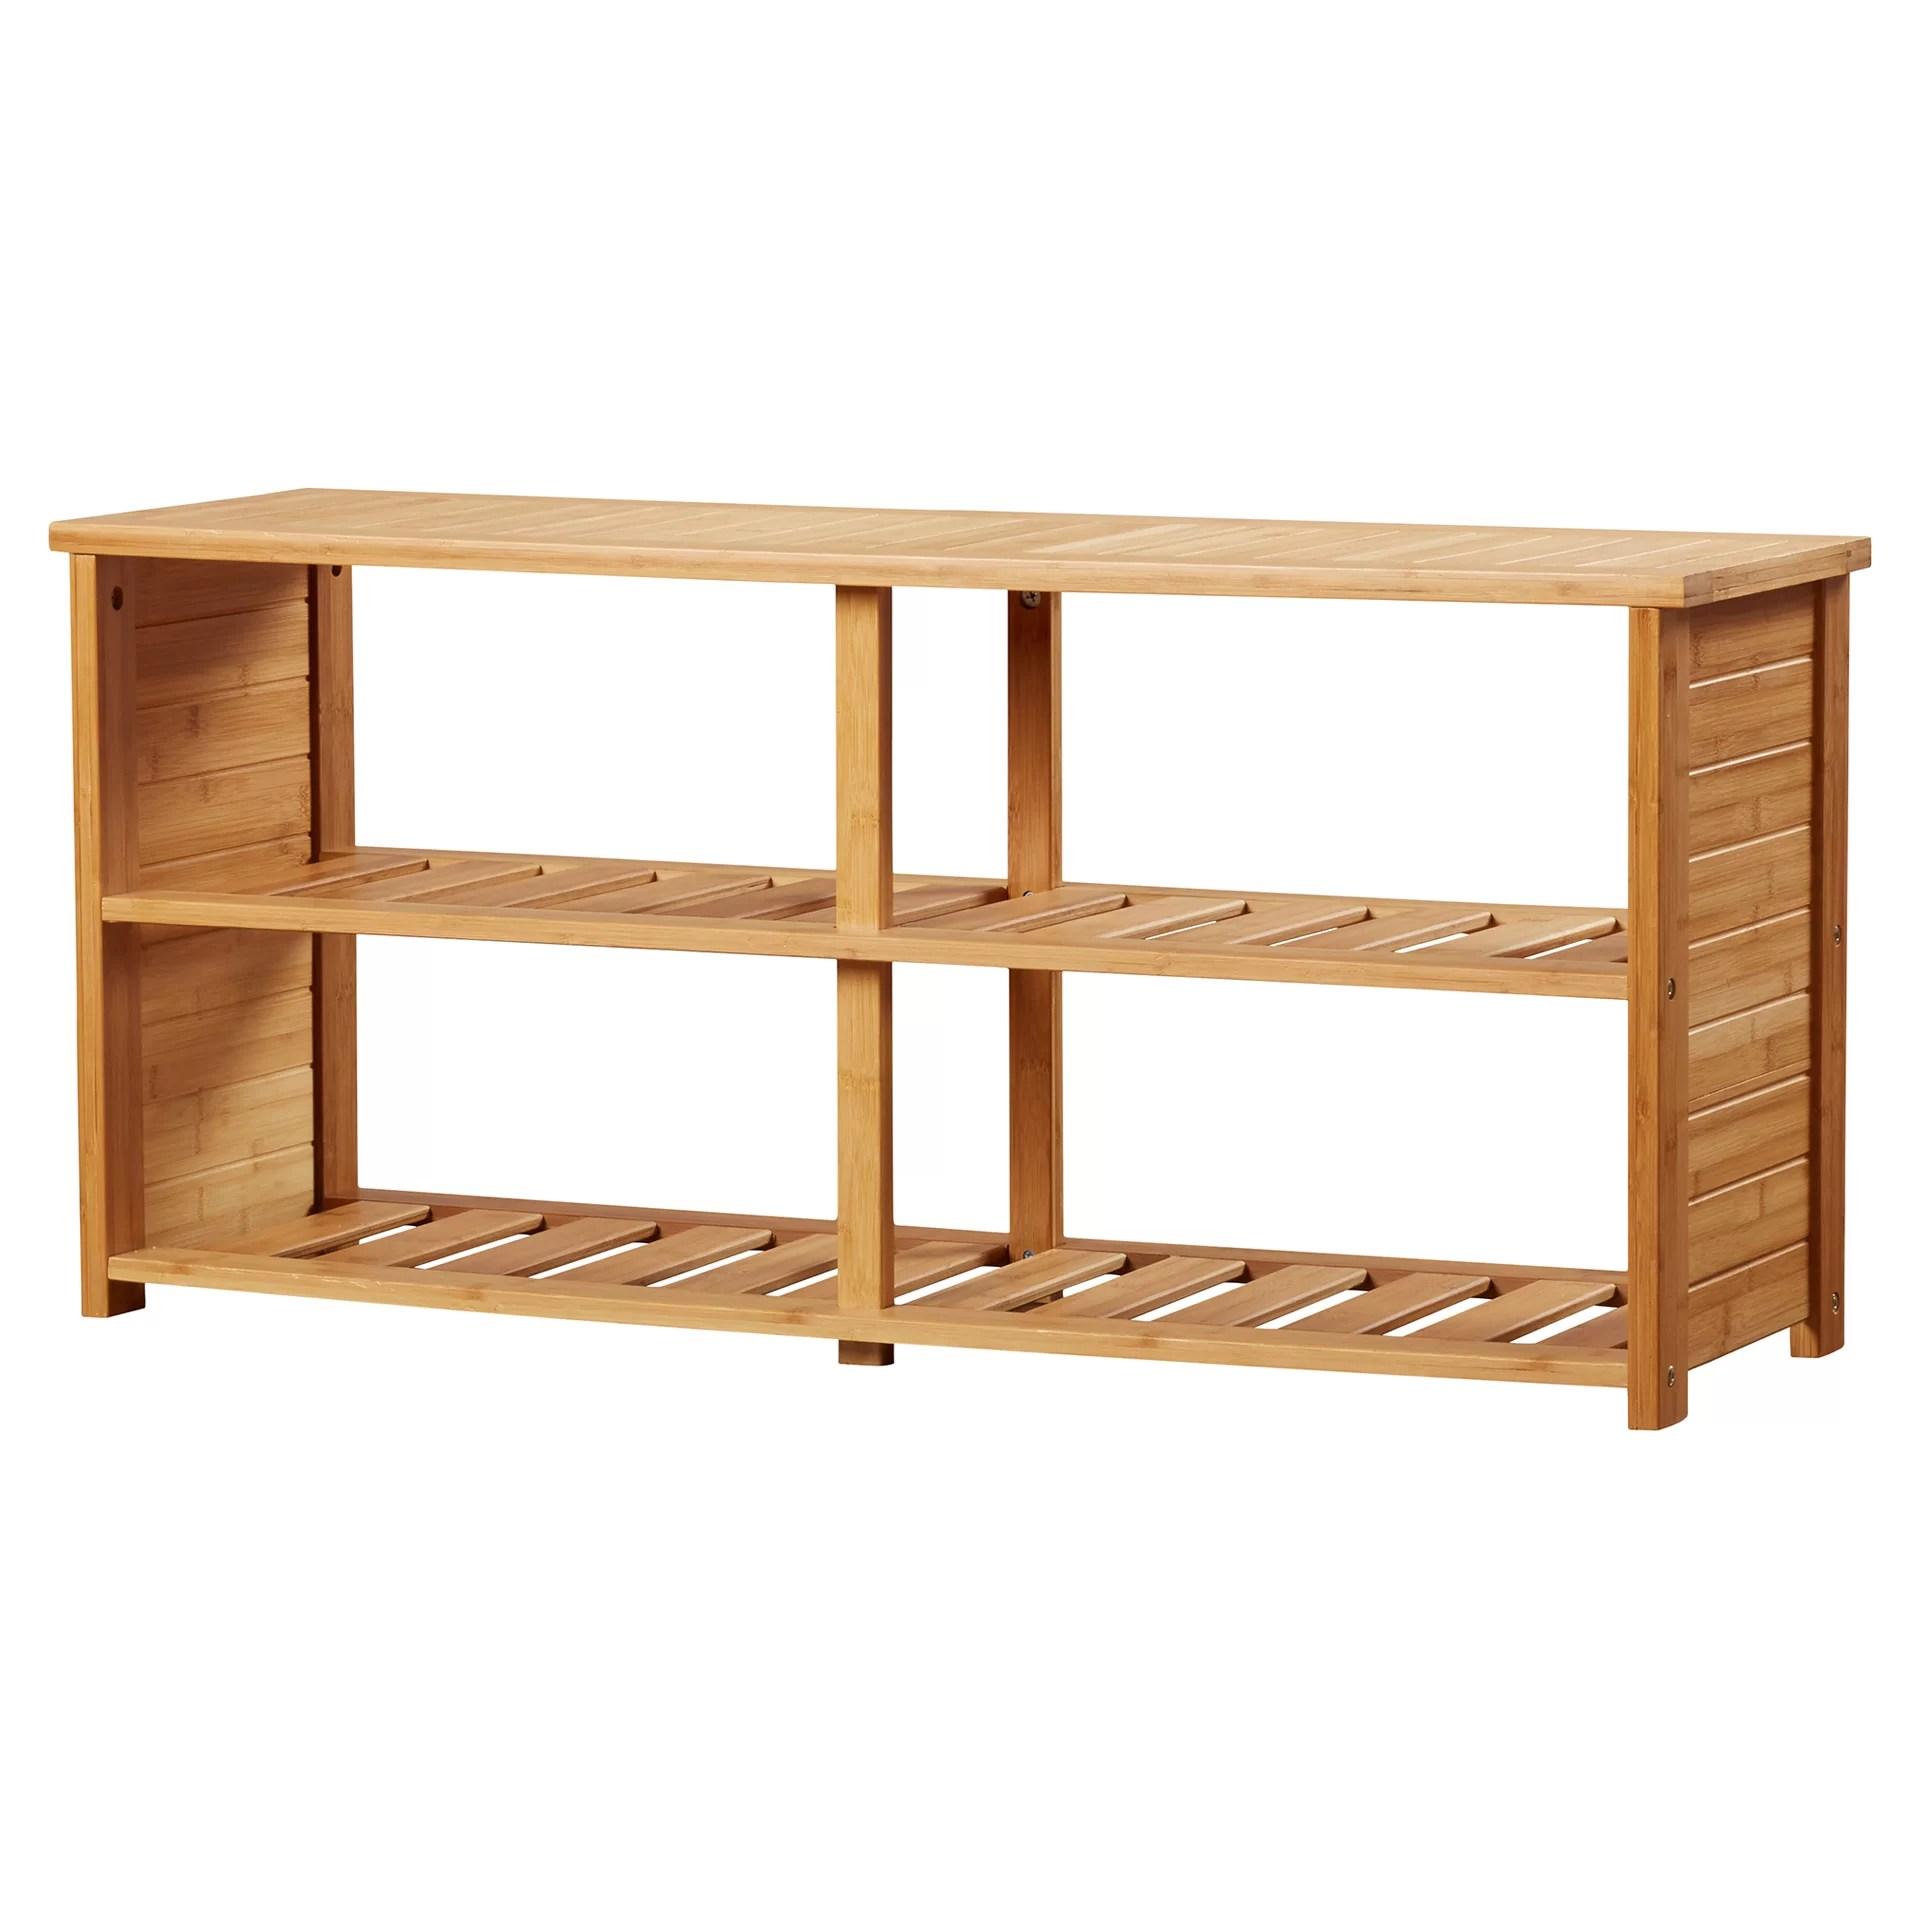 Beachcrest Home 10 Pair Bamboo Shoe Storage Bench Reviews Wayfair